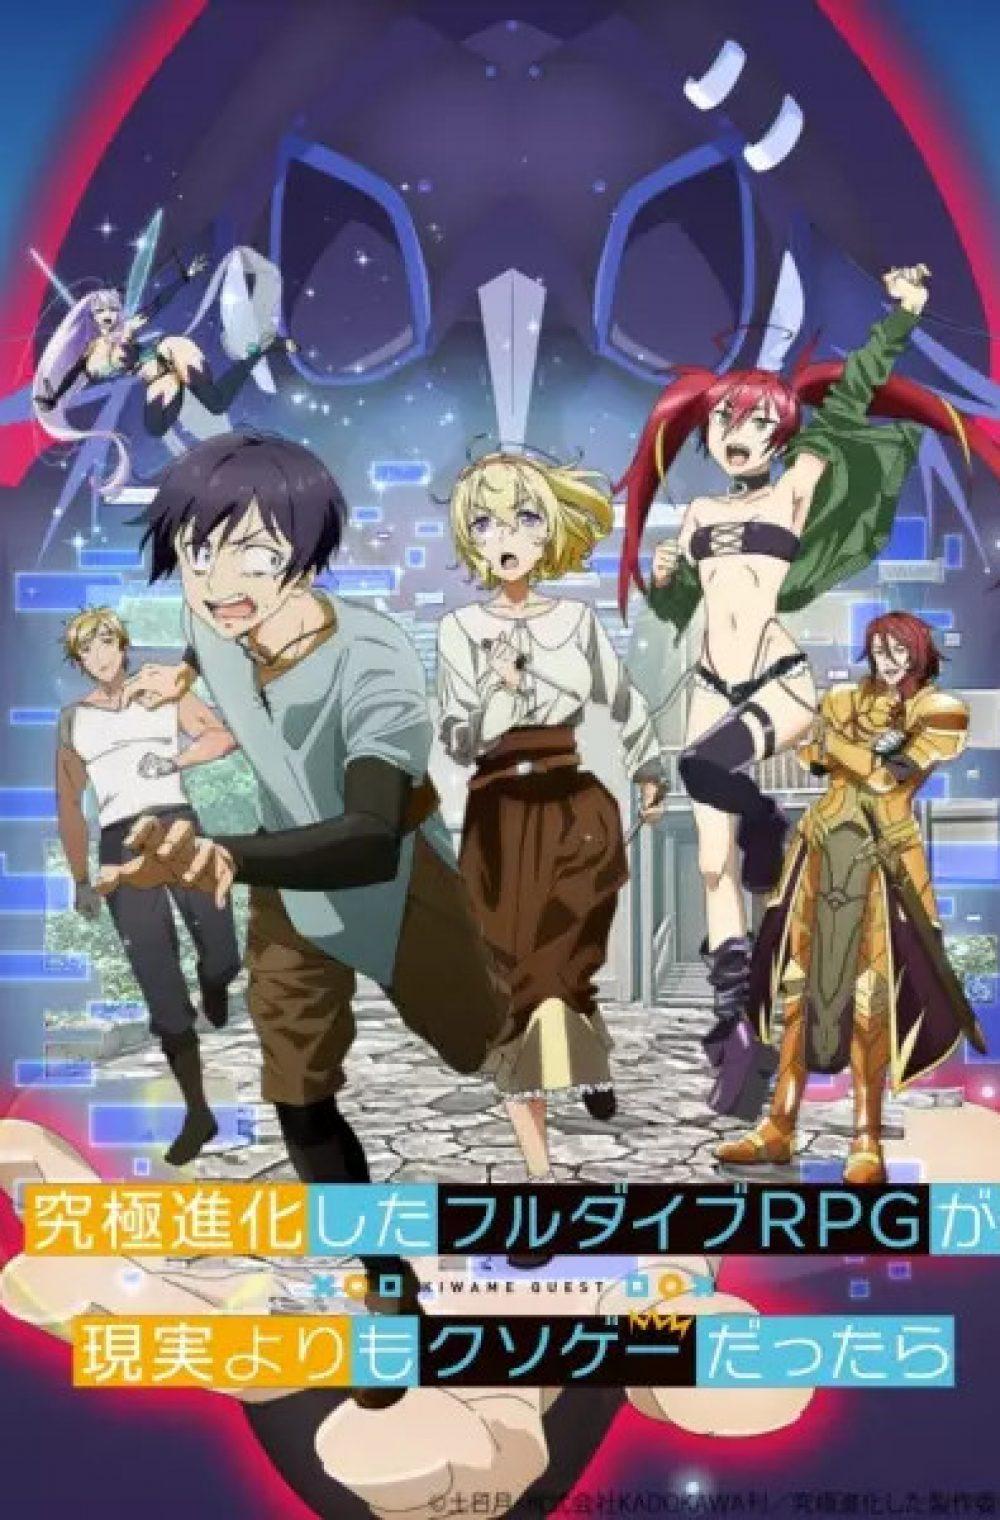 Full Dive: The Ultimate Next-Gen Full Dive RPG Is Even Shittier than Real Life! – Kyuukyoku Shinka shita Full Dive RPG ga Genjitsu yori mo Kusoge Dattara